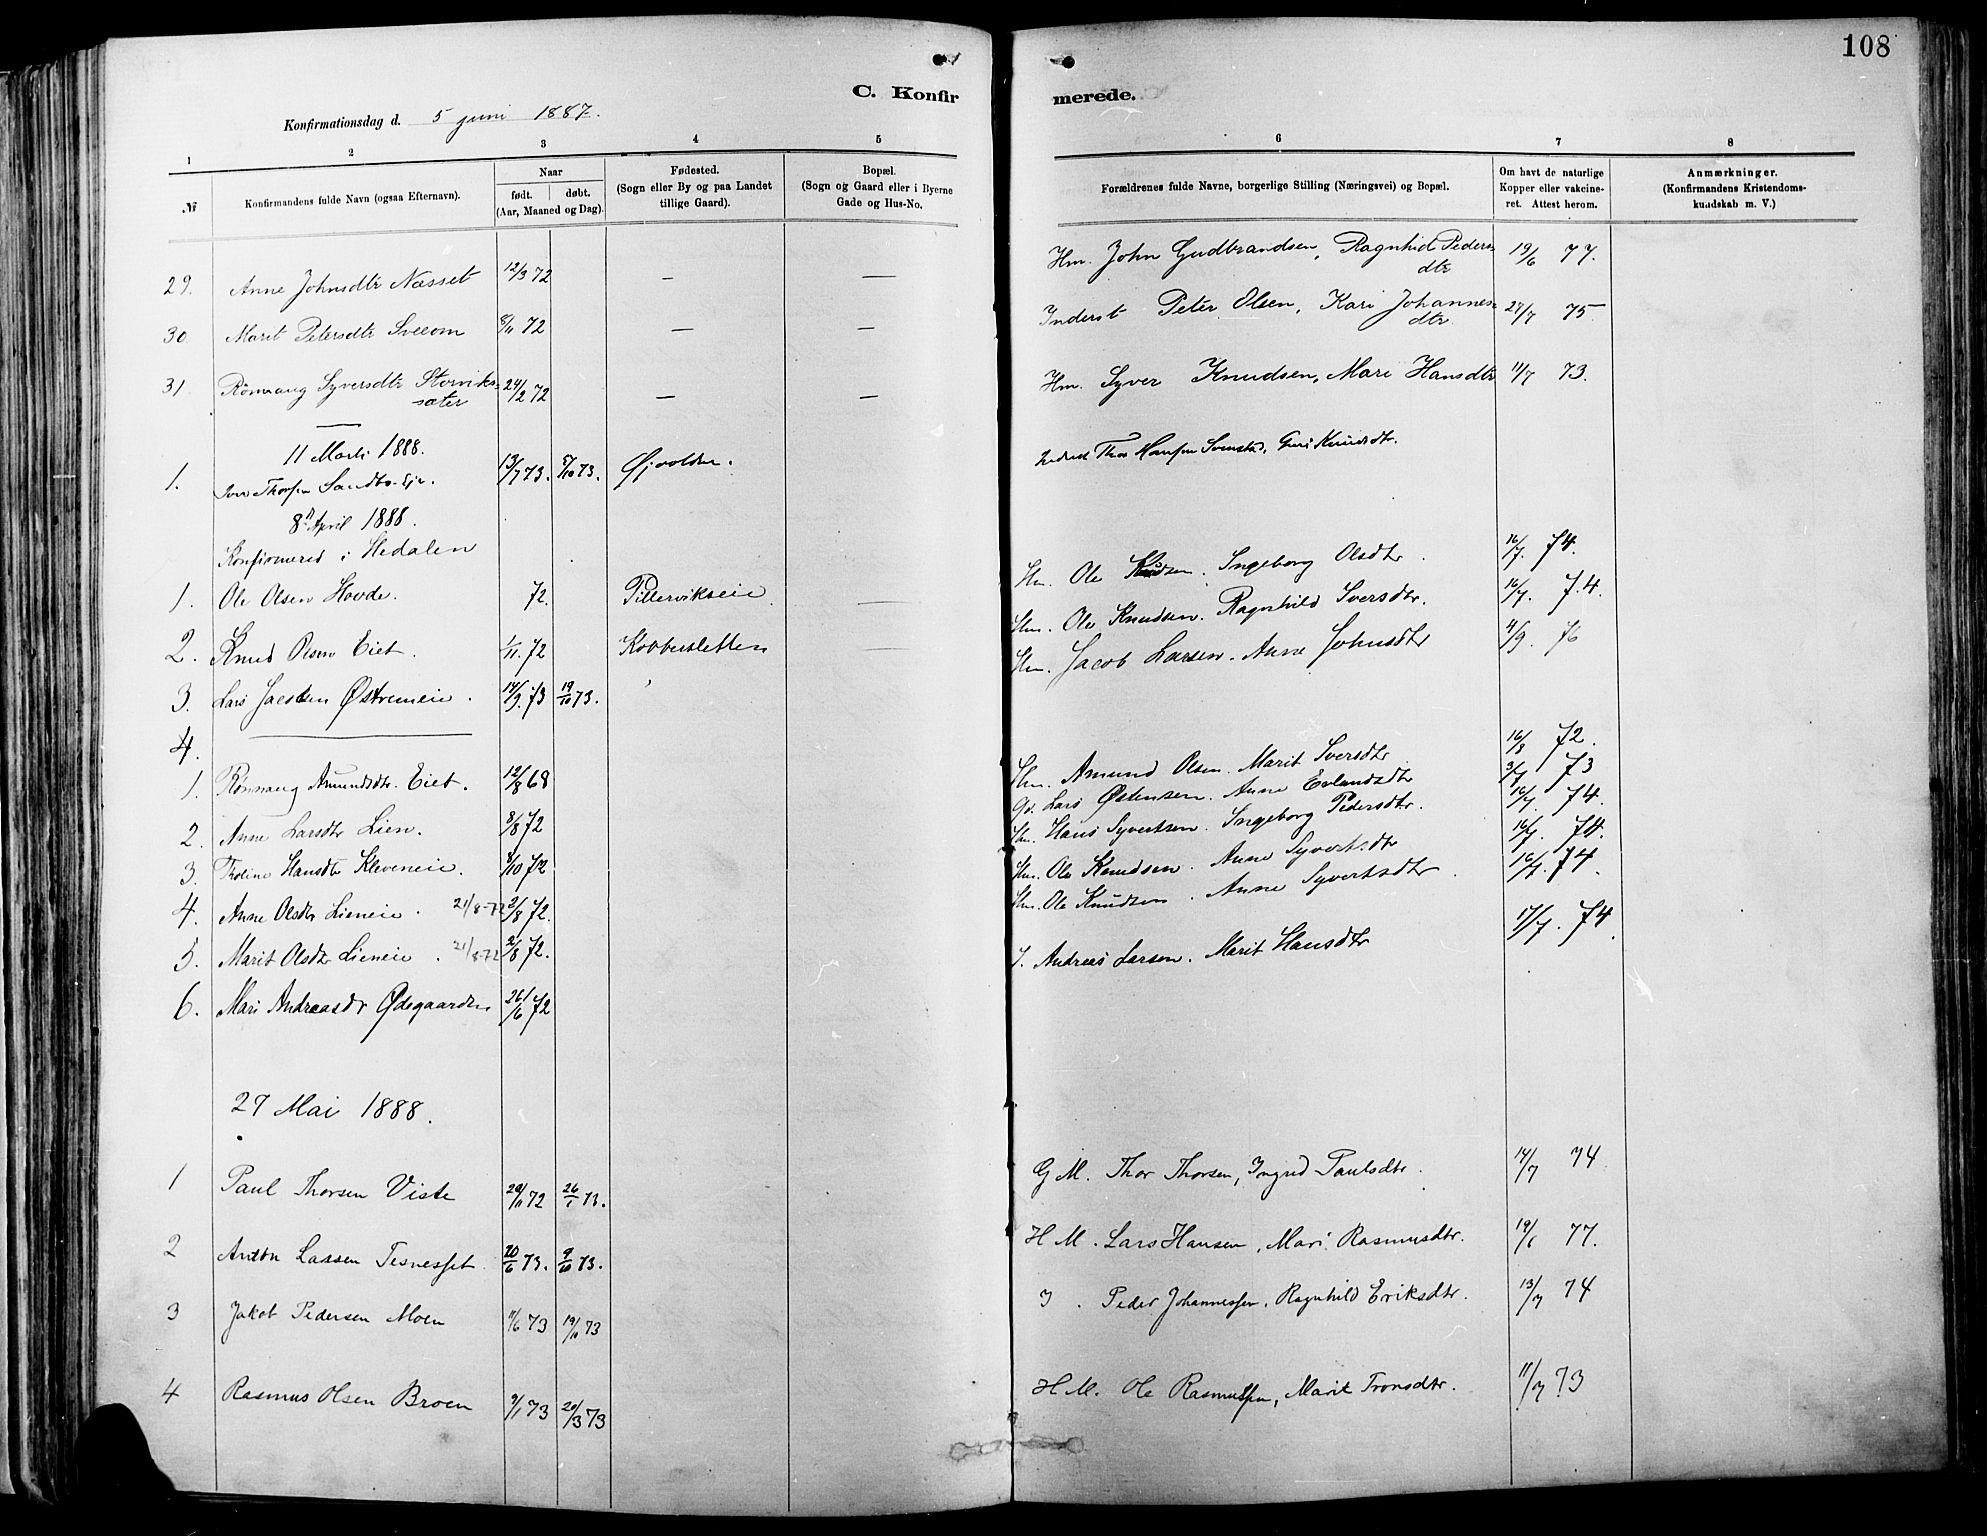 SAH, Vågå prestekontor, Ministerialbok nr. 9, 1886-1904, s. 108